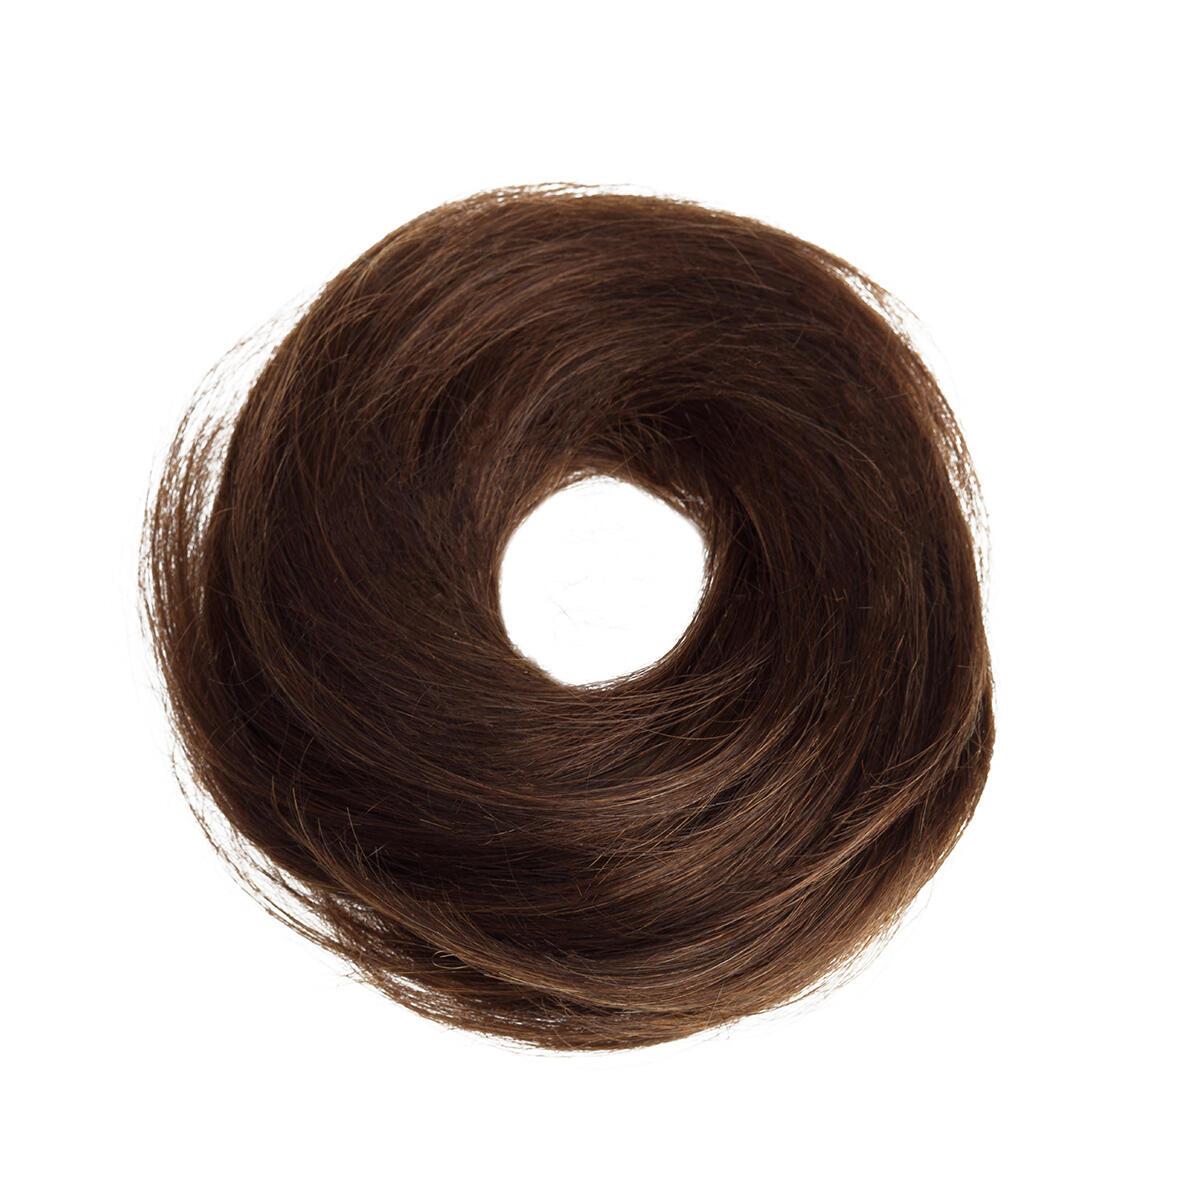 Volume Hair Scrunchie Original 40 g 2.2 Coffee Brown 0 cm